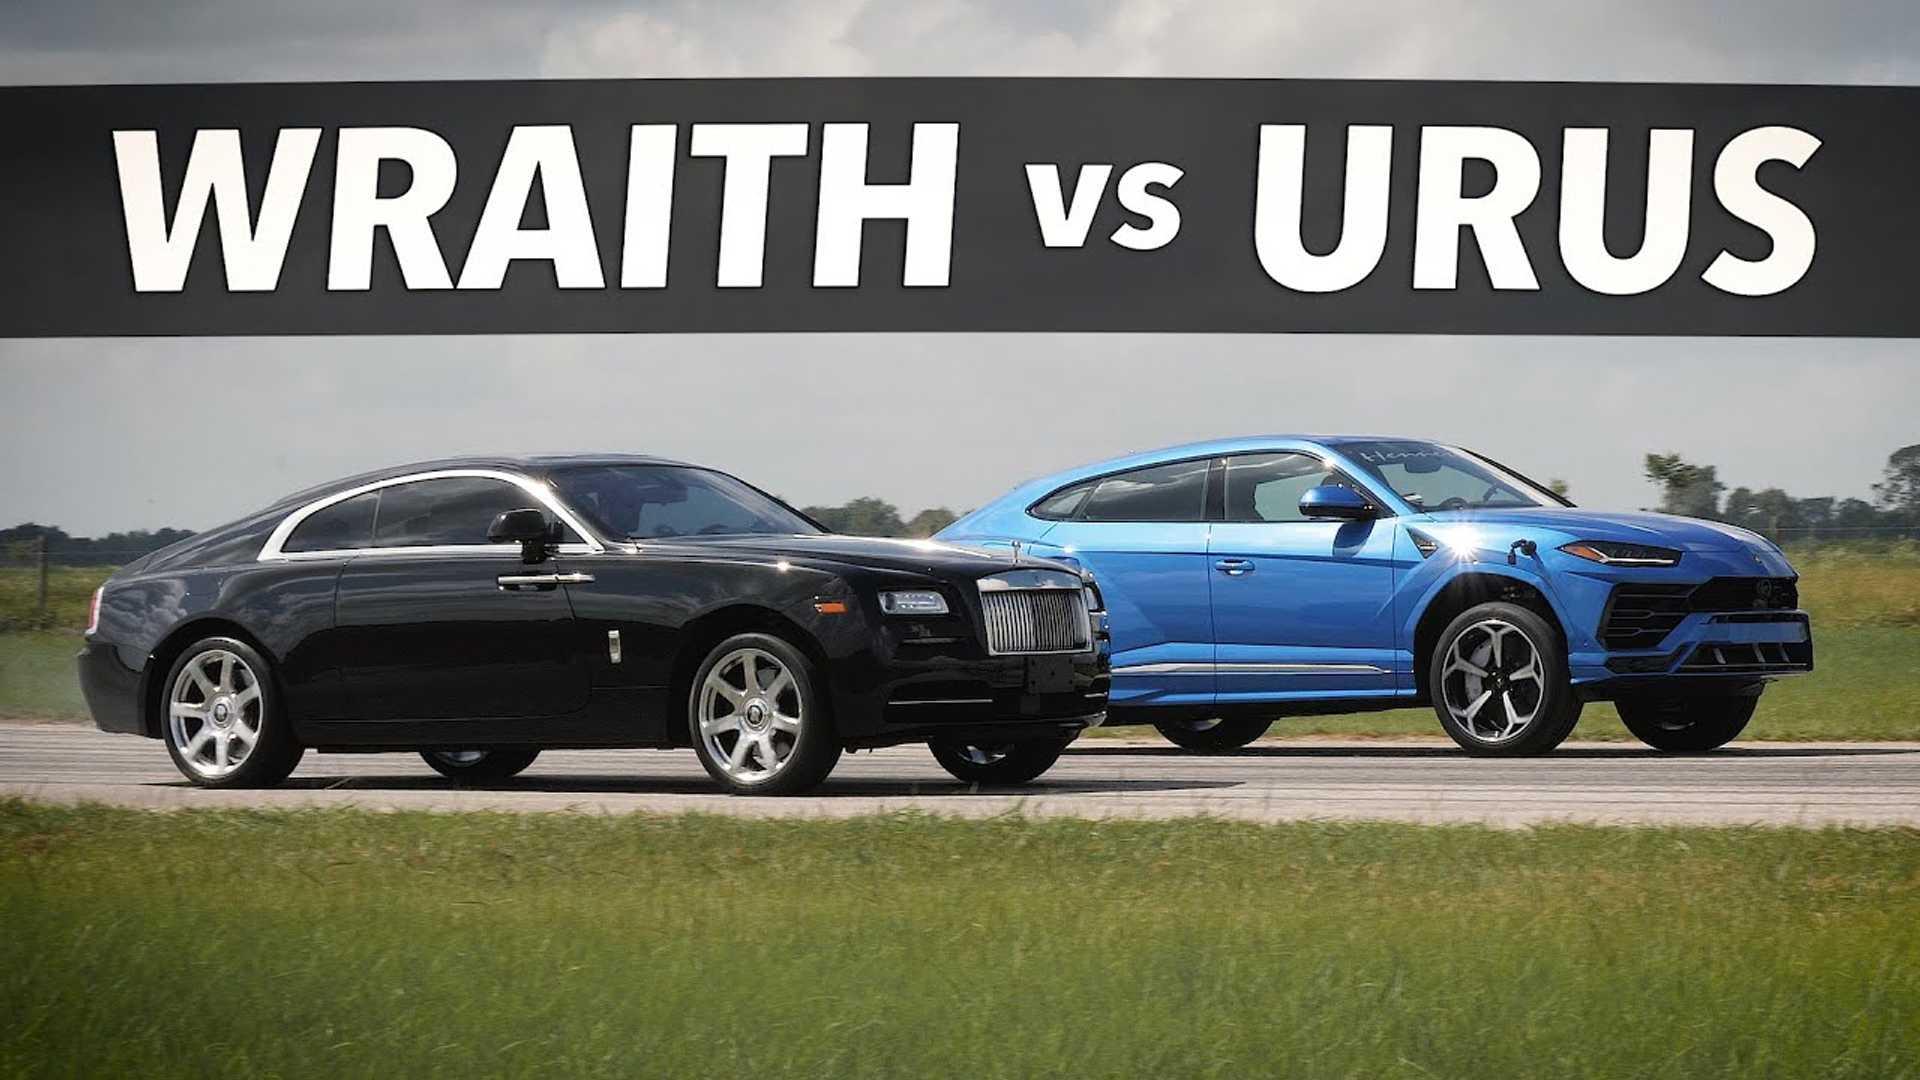 Lamborghini Urus vs. Rolls Royce Wraith